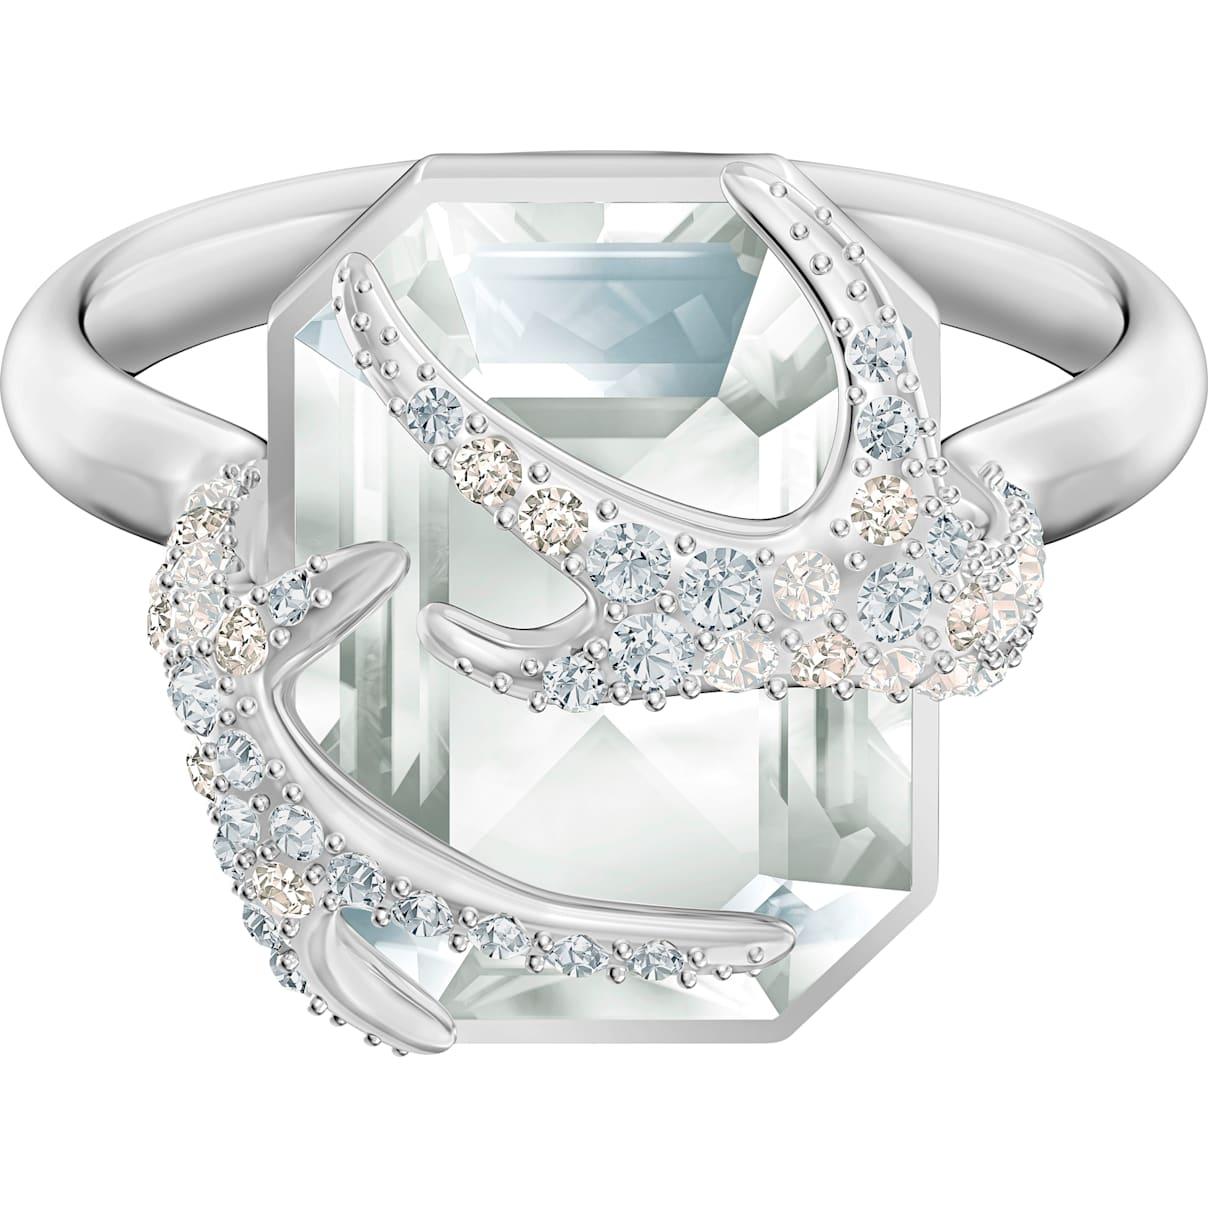 Swarovski Polar Bestiary Cocktail Ring, Multi-colored, Rhodium plated